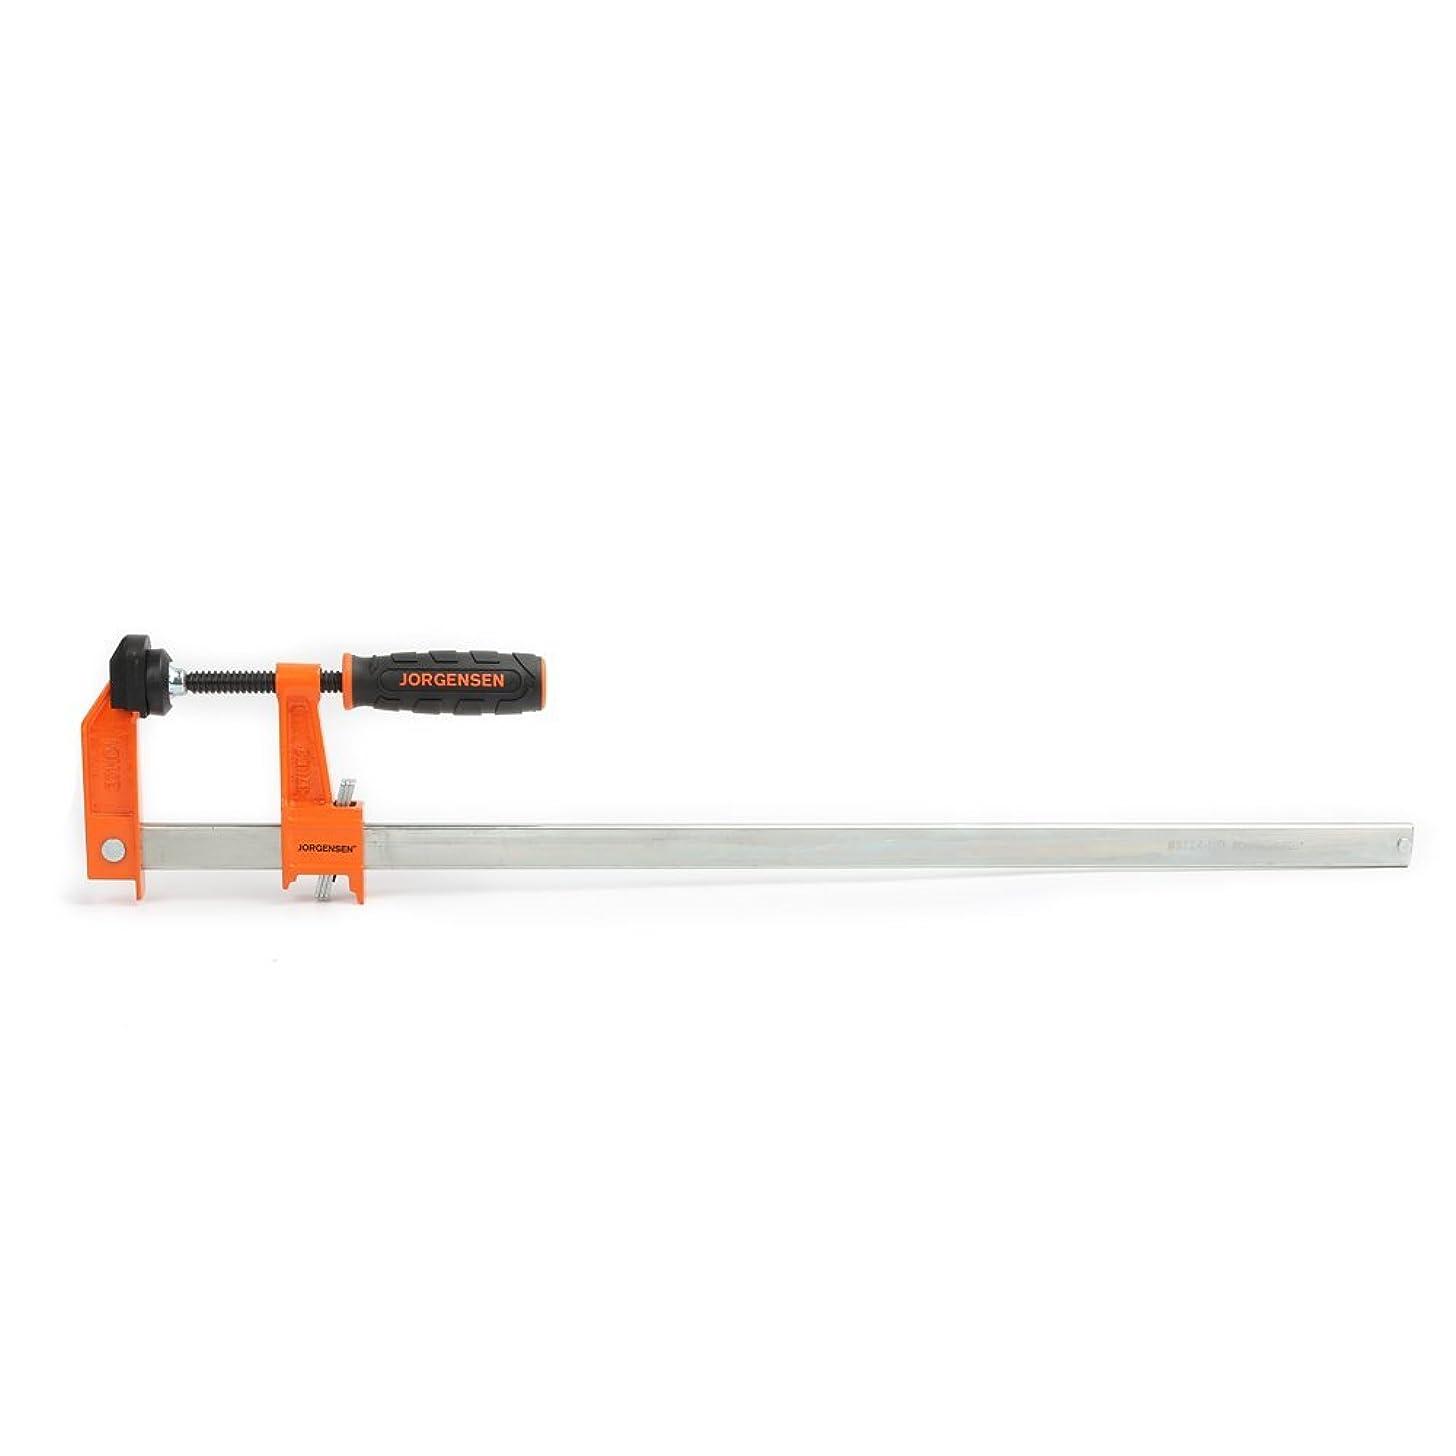 Jorgensen 3724-HD 24-Inch Heavy-Duty Steel Bar Clamp